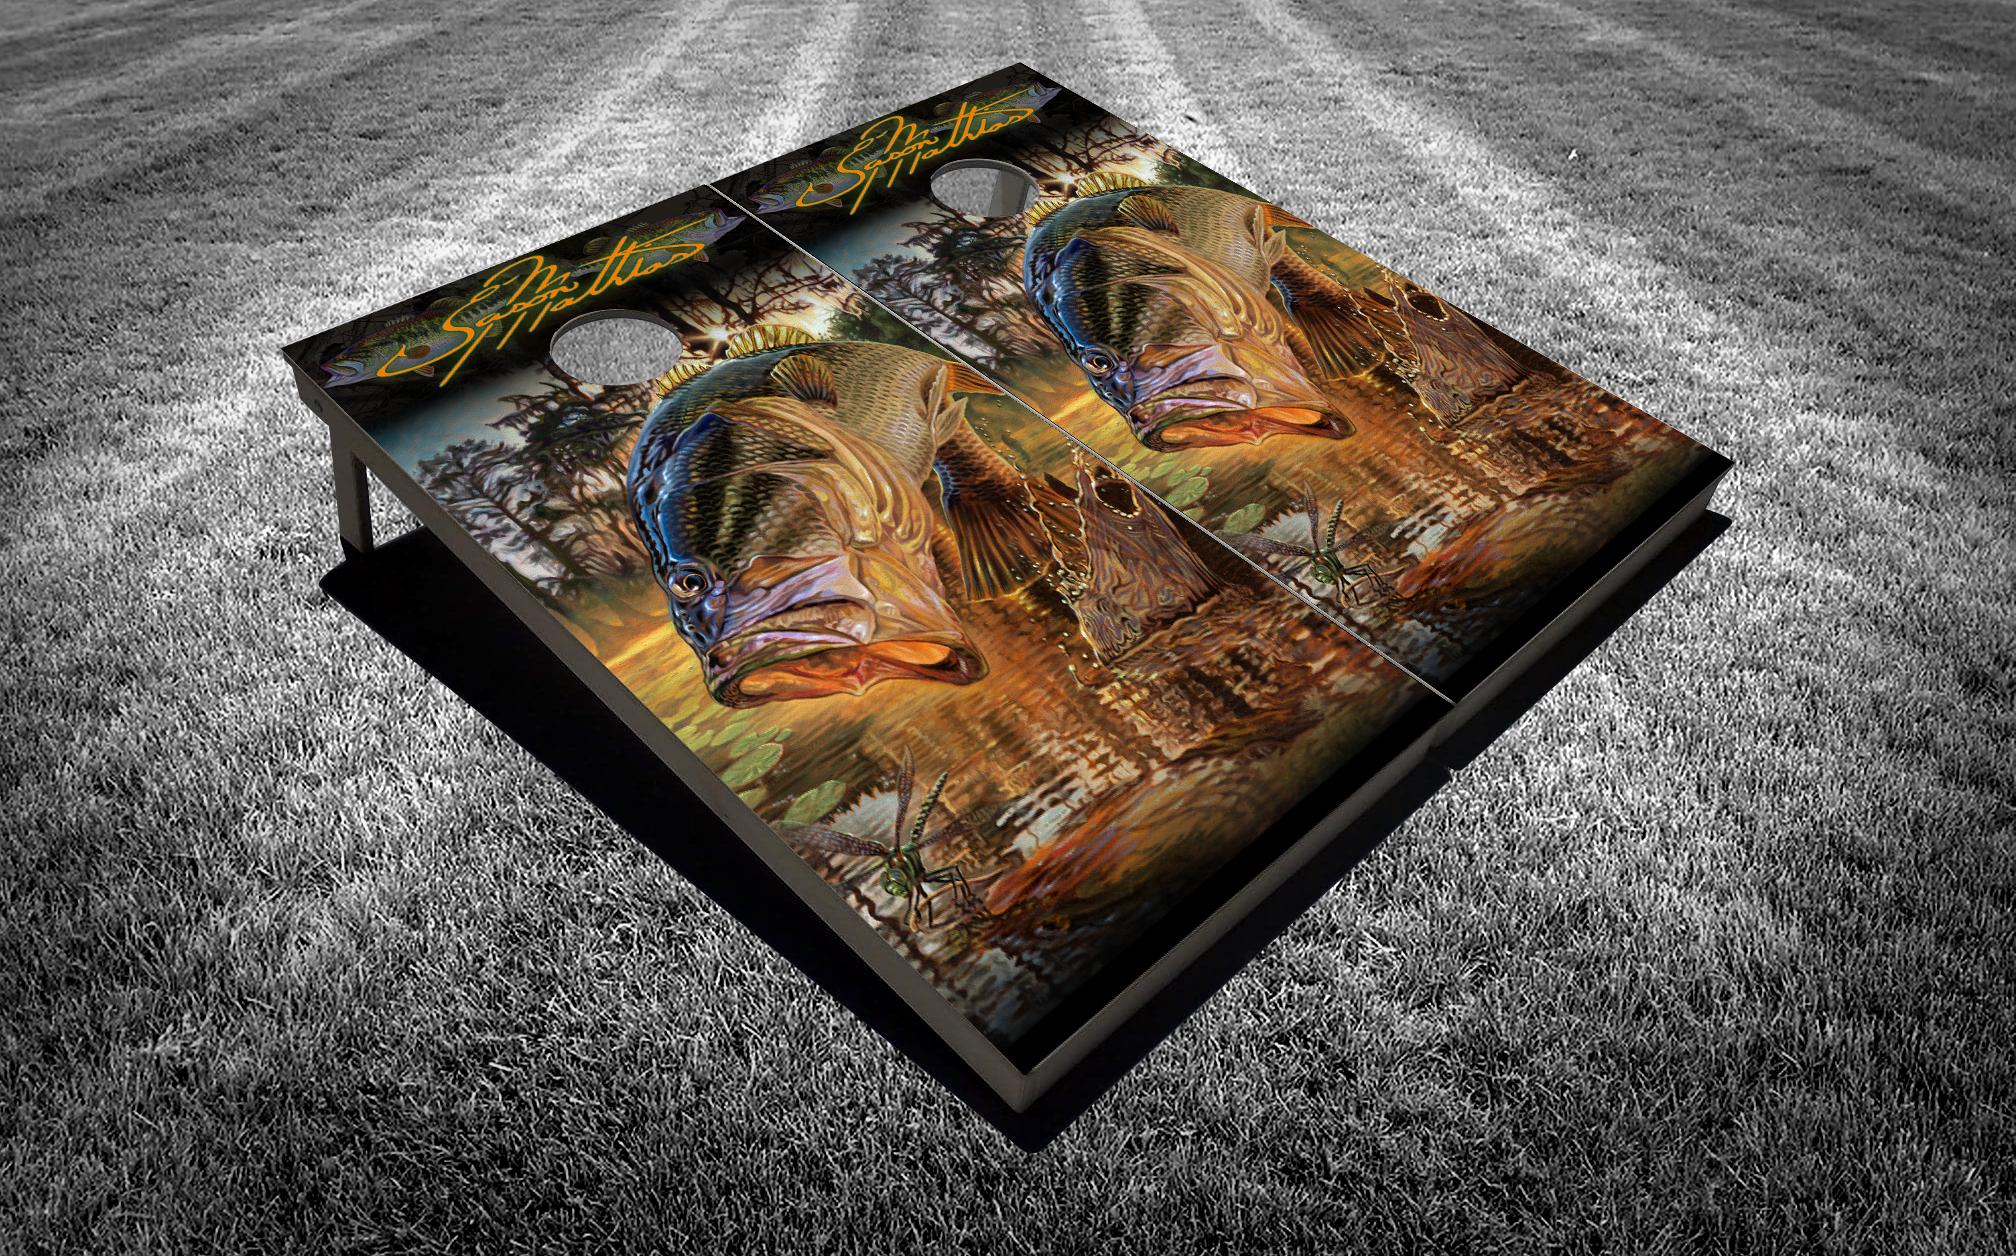 jason-mathias-cornhole-board-large-mouth-bass-artwork.jpg